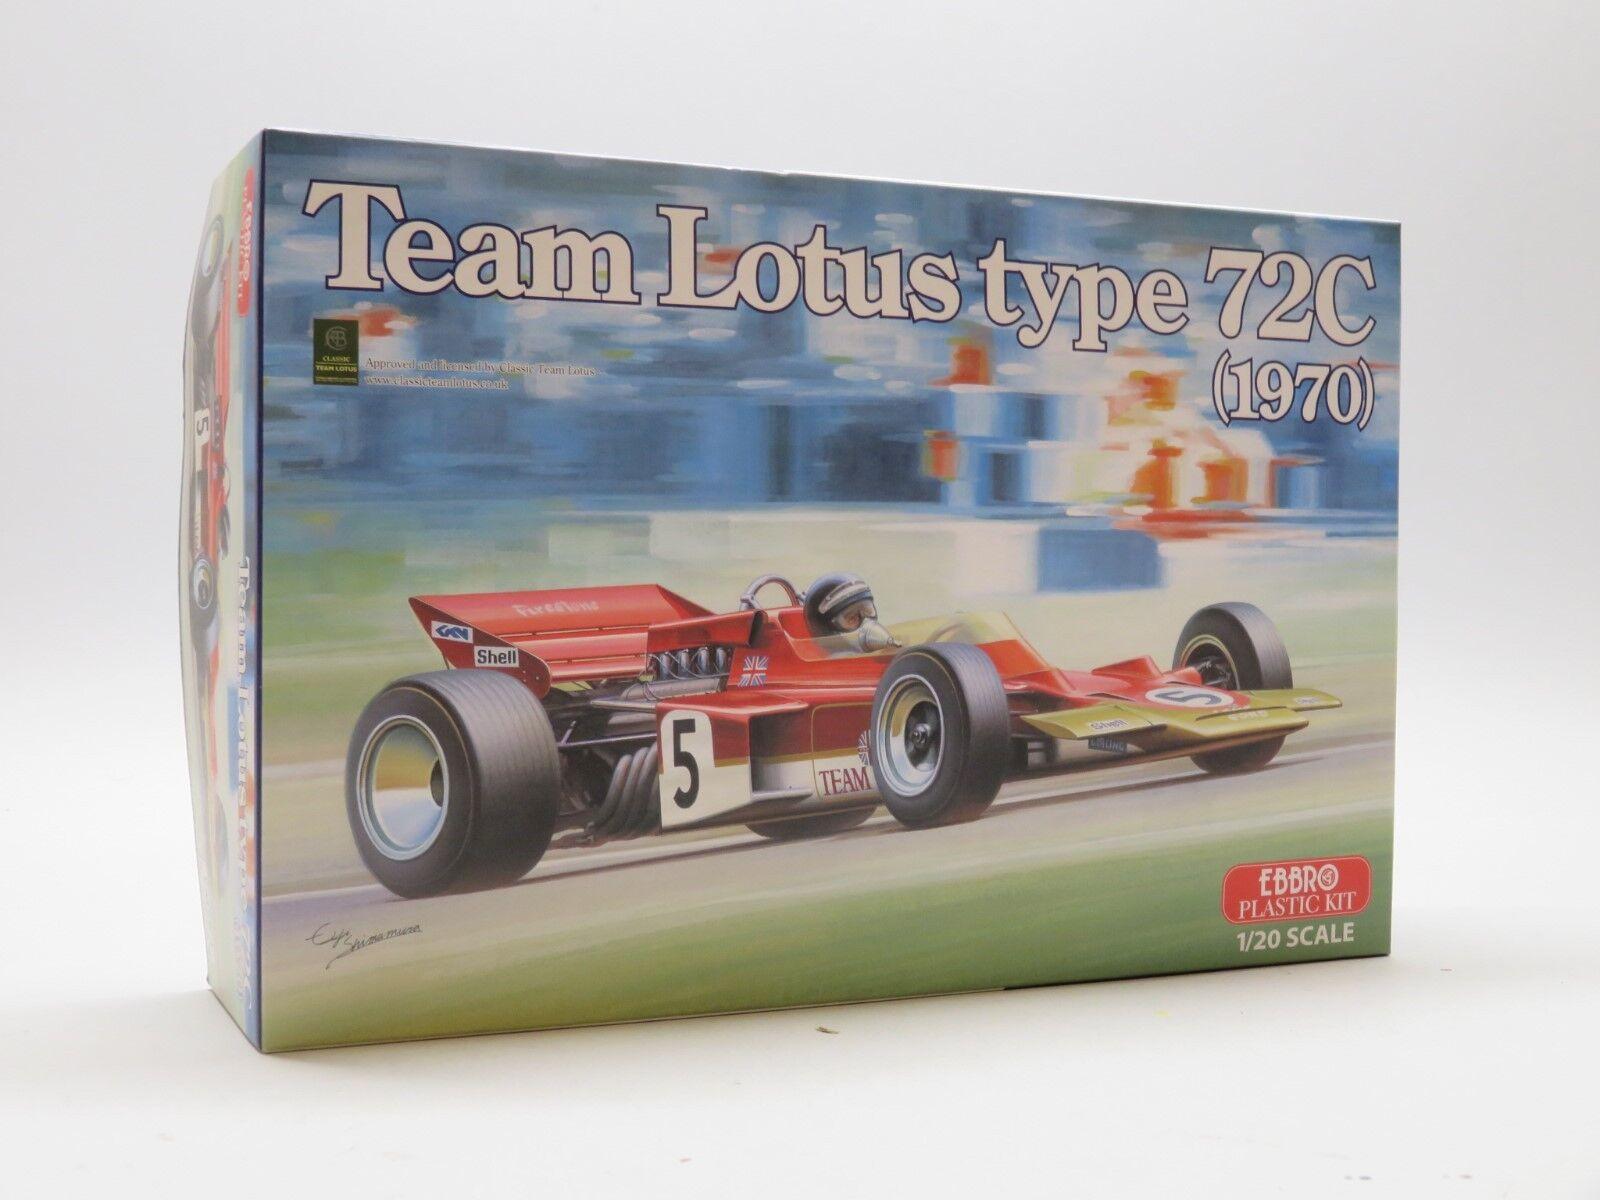 1 20 EBBRO Team Lotus type 72C 1970 EMSF-1 001-5800